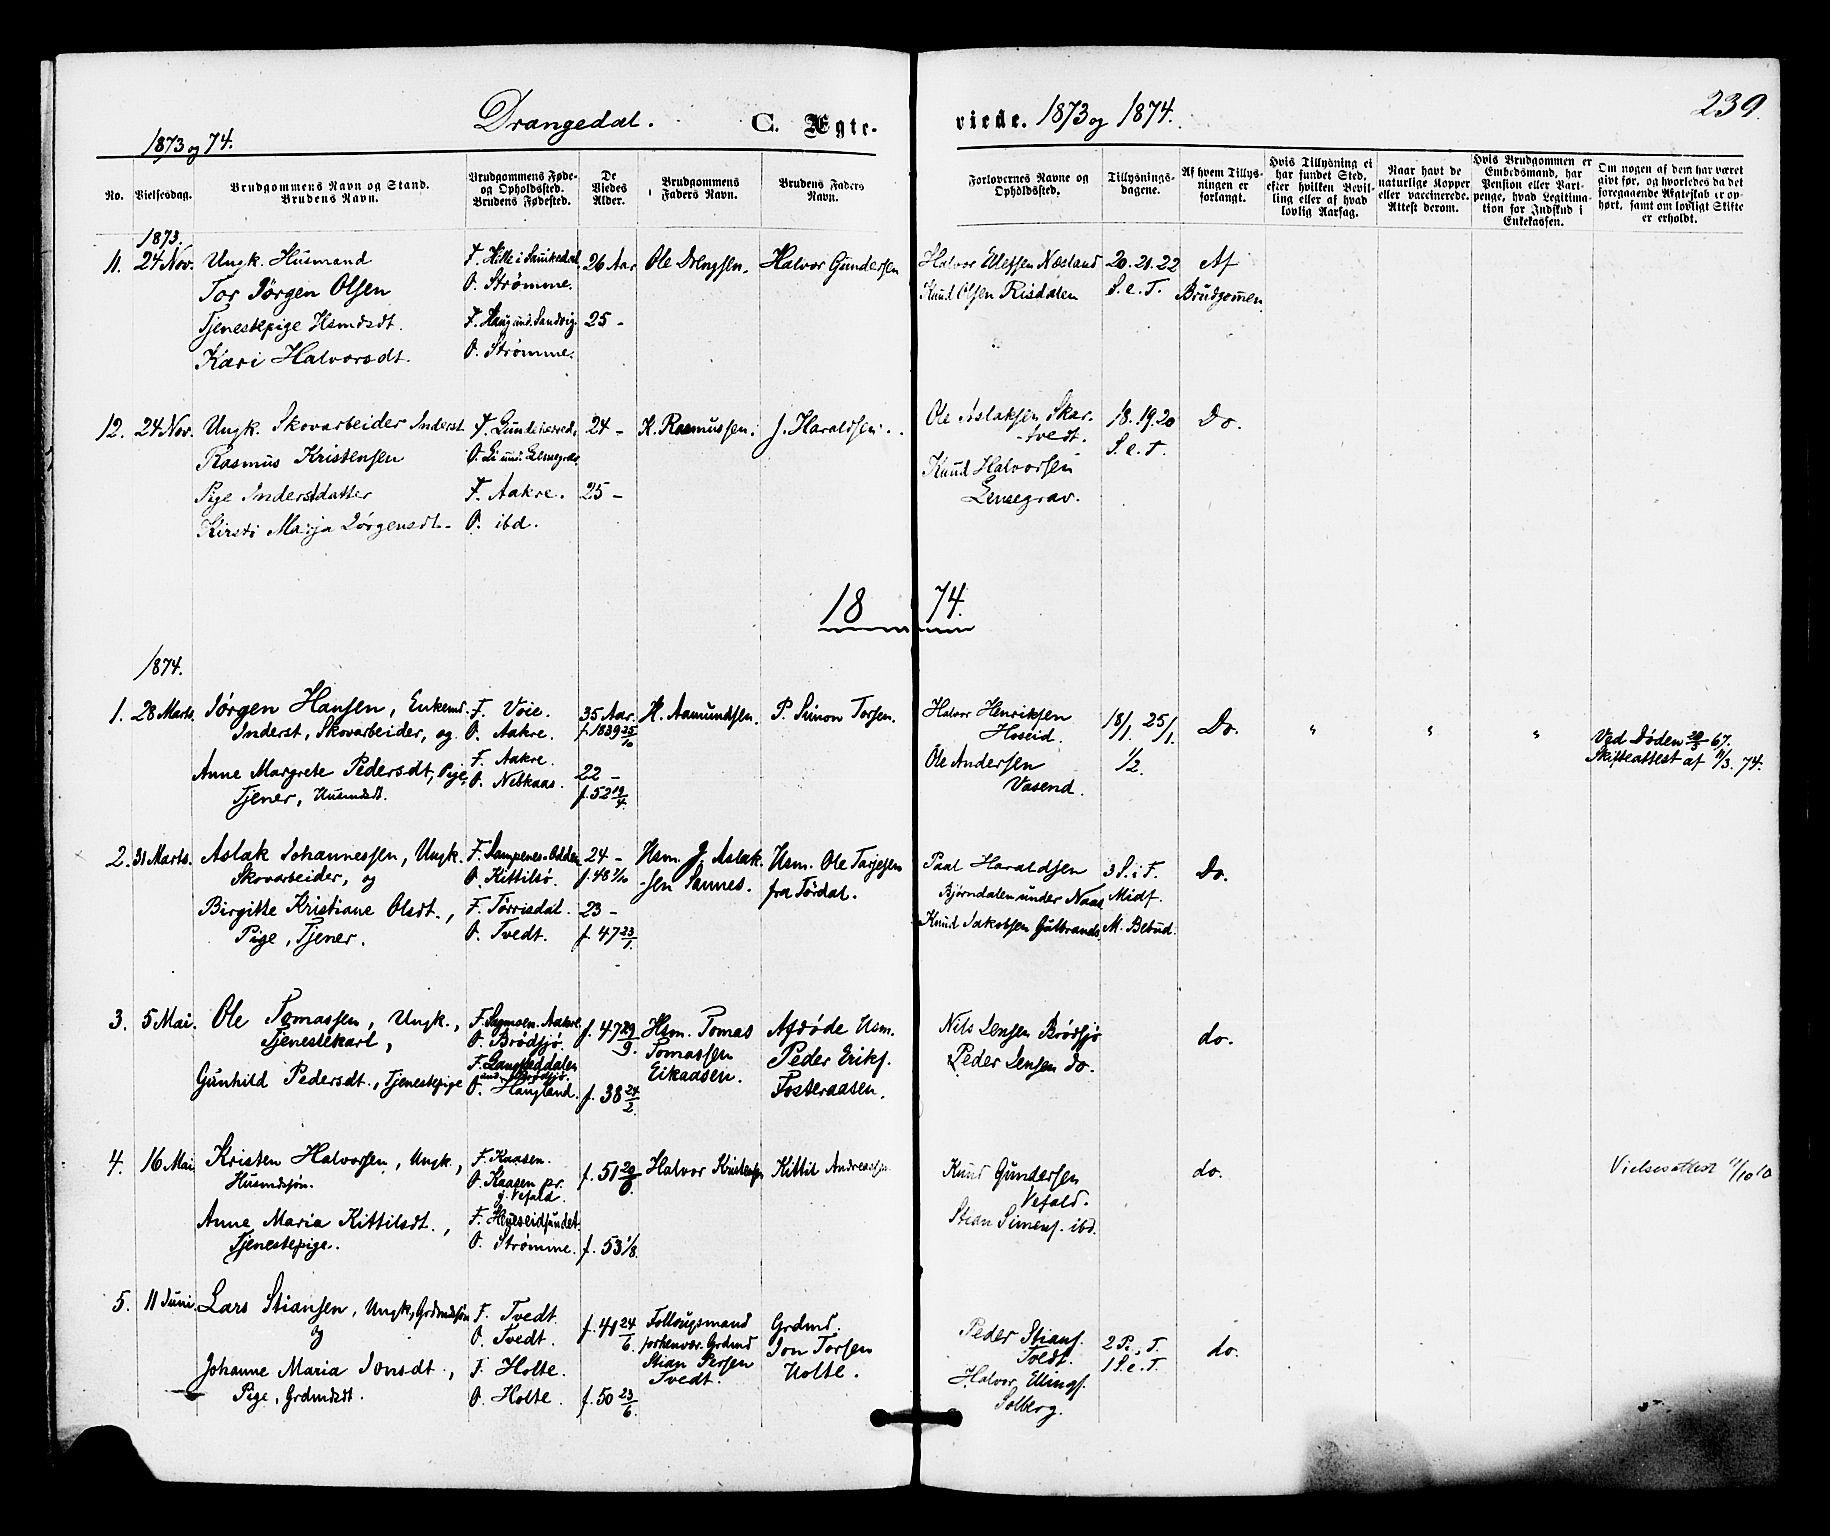 SAKO, Drangedal kirkebøker, F/Fa/L0009: Ministerialbok nr. 9 /1, 1872-1884, s. 239